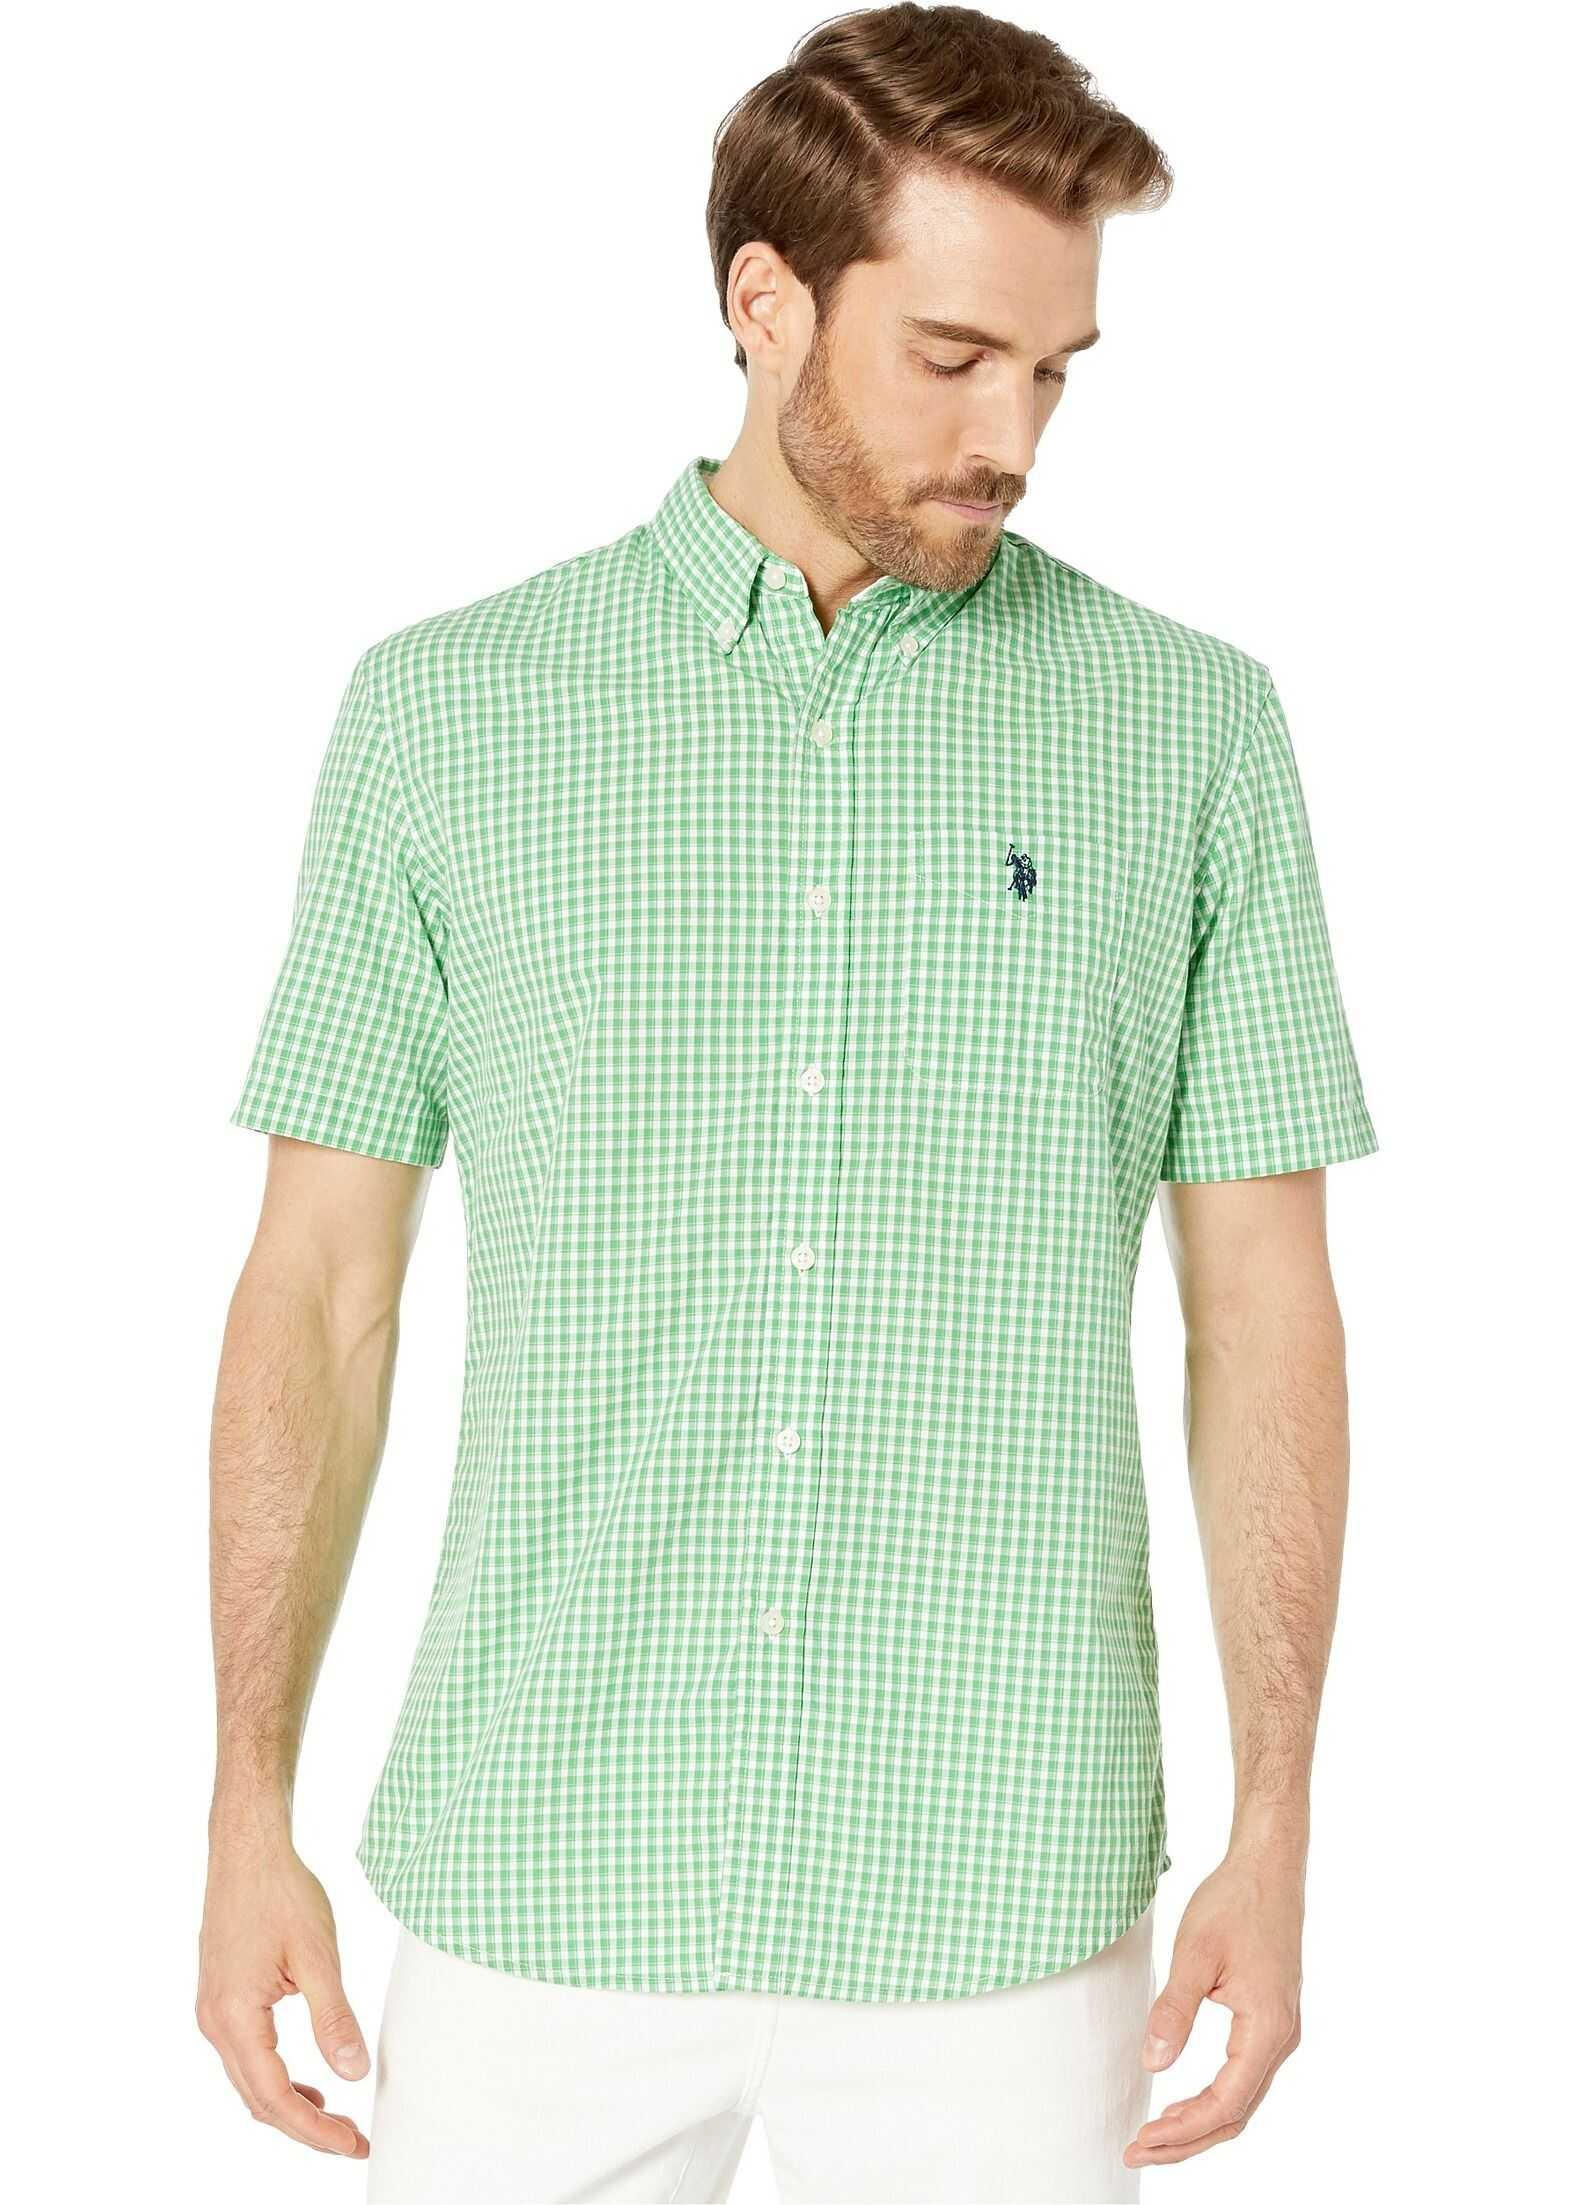 U.S. POLO ASSN. Short Sleeve Gingham Woven Hockney Green